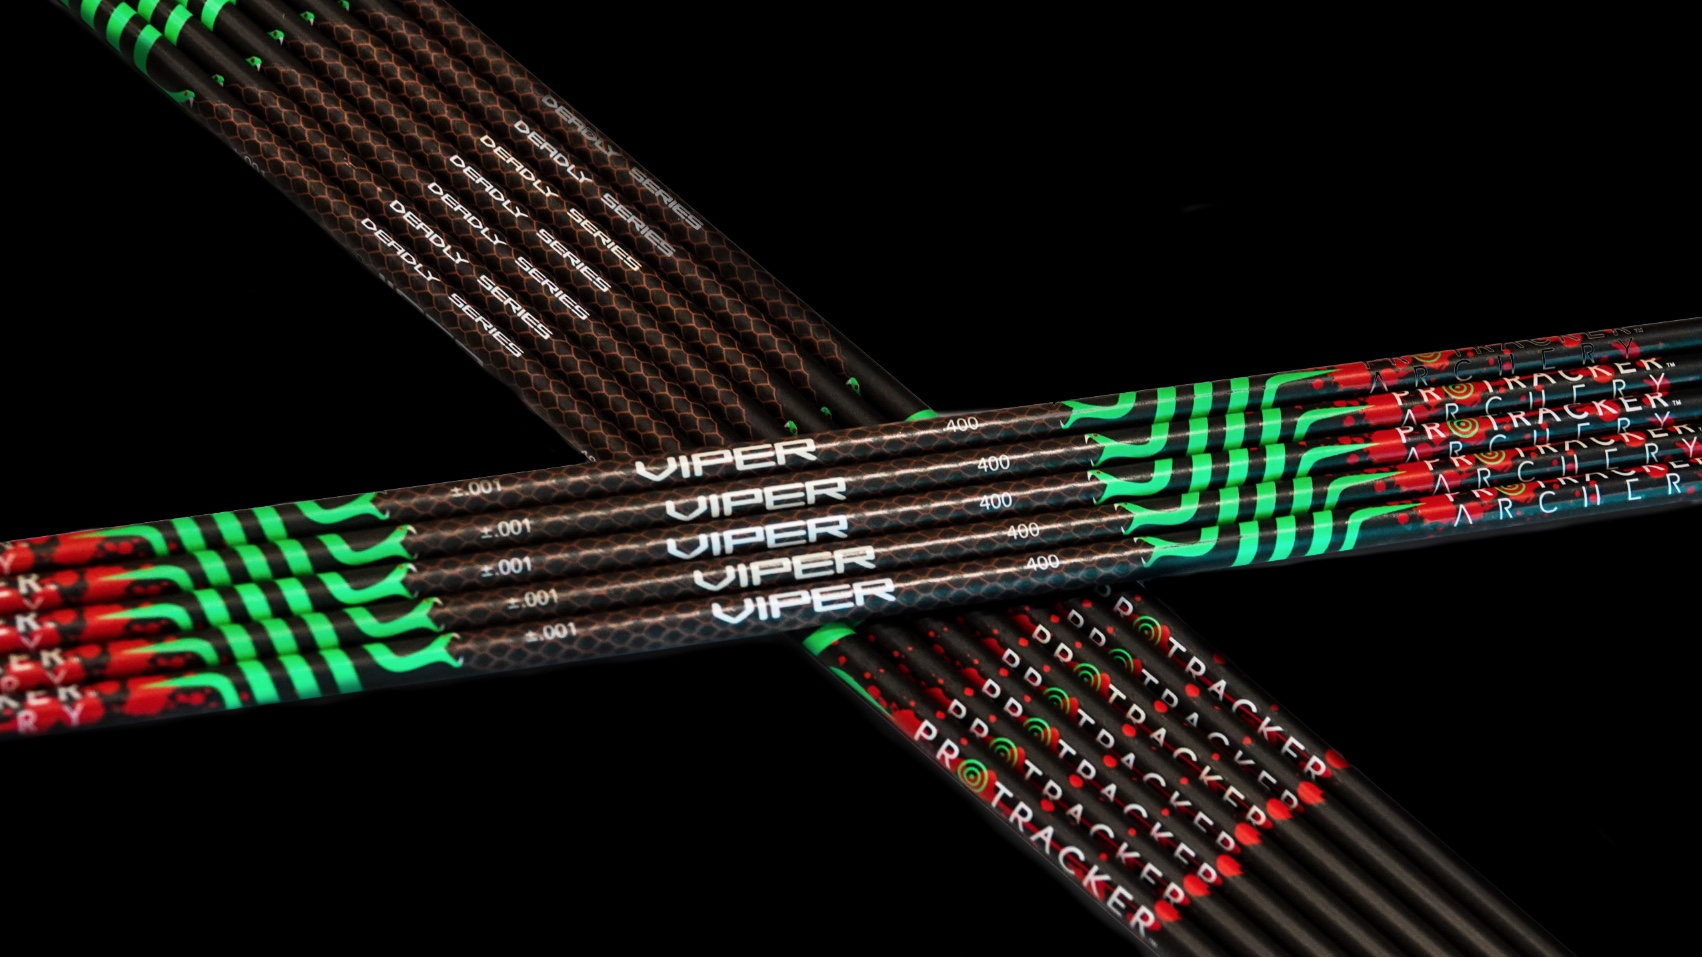 Carbon fibers arrows Protracker archery